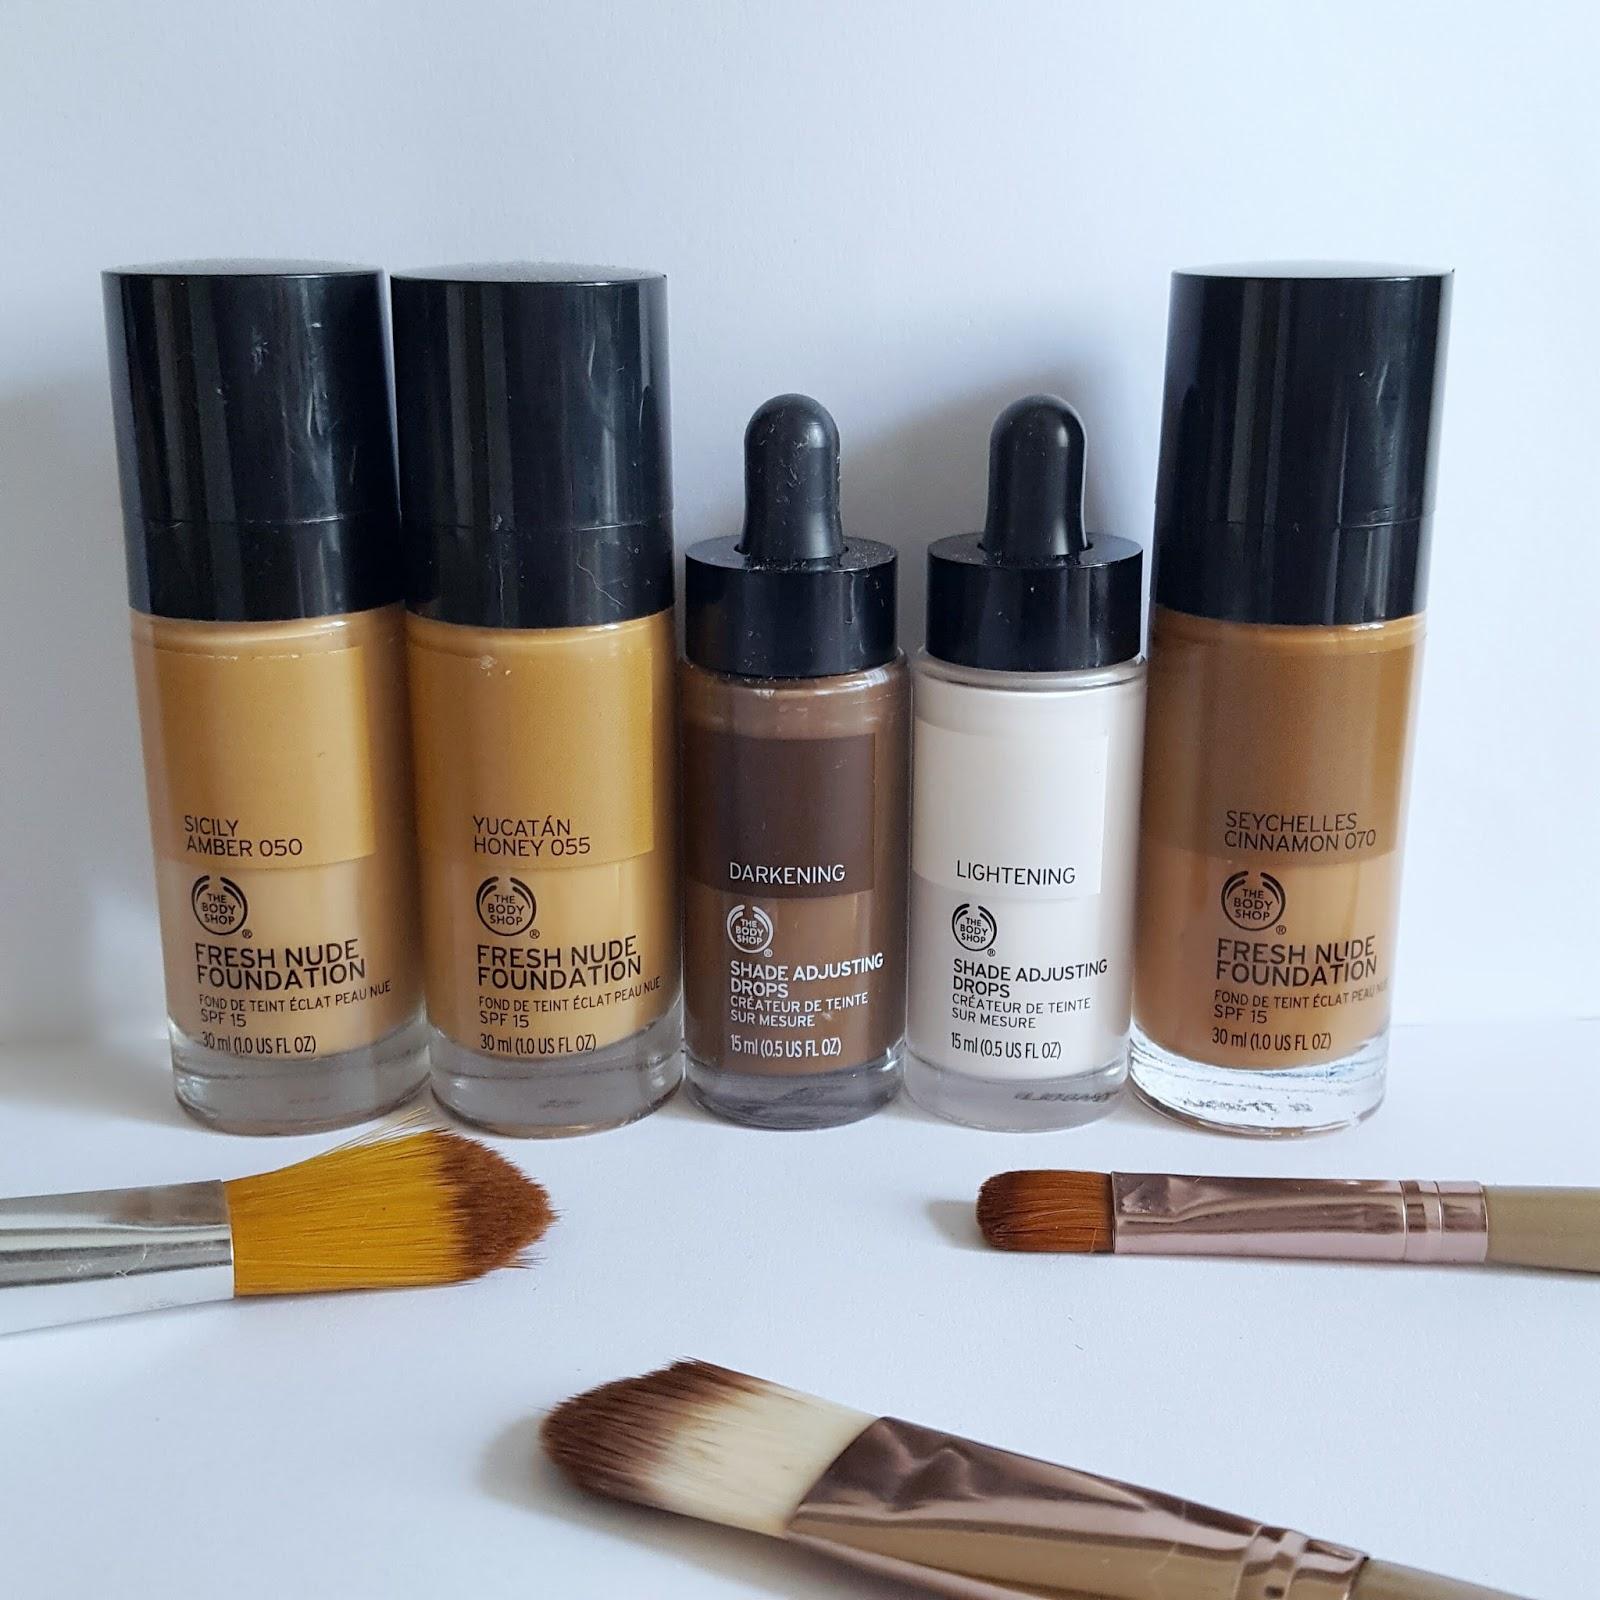 The Body Shop Best Makeup Finds: Matching My Melanin